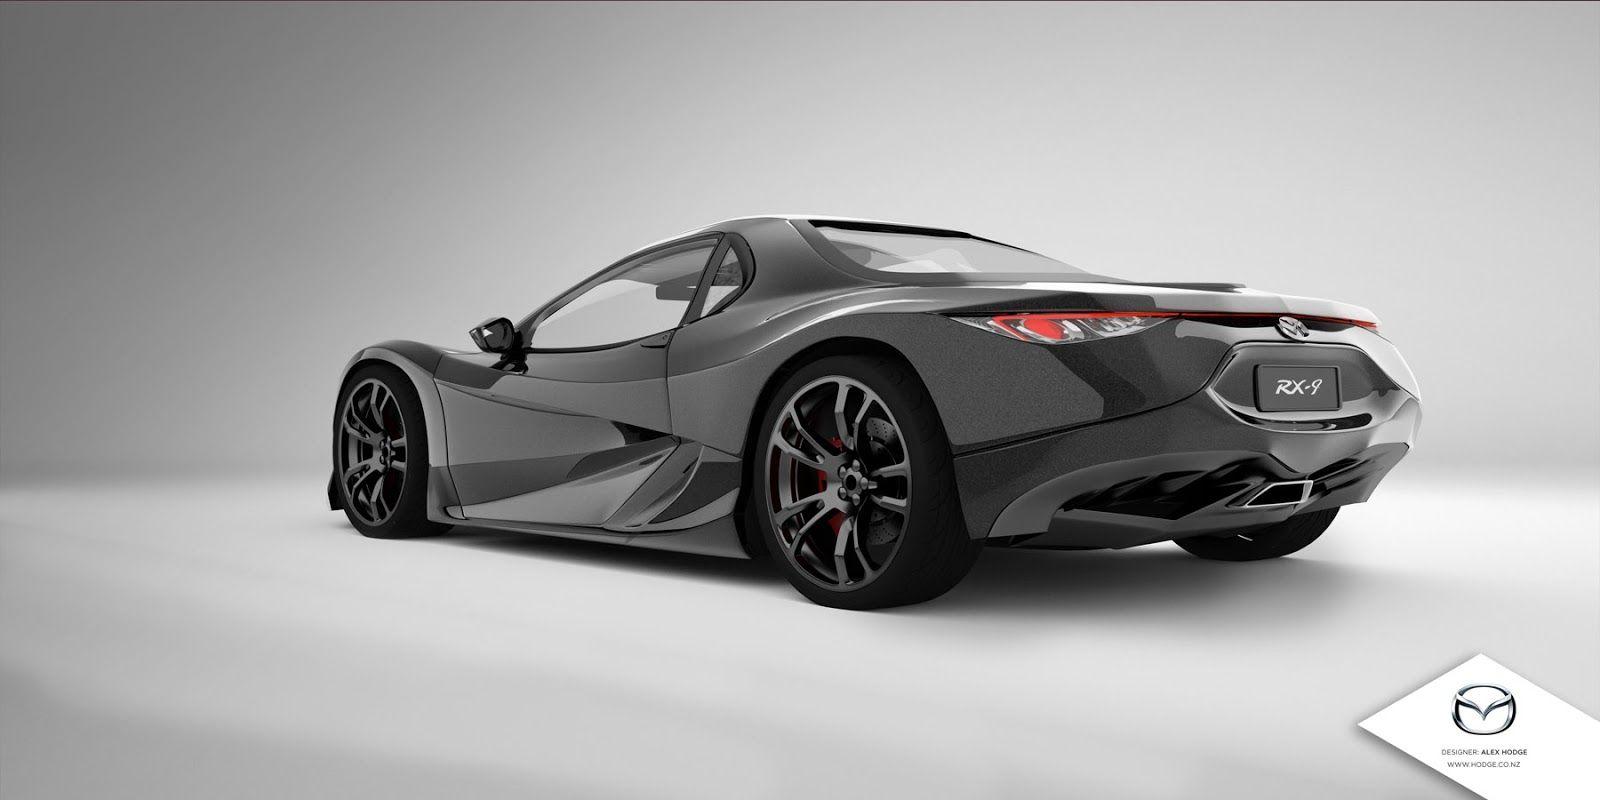 2018 Mazda RX9 Mid Engine Design Concept